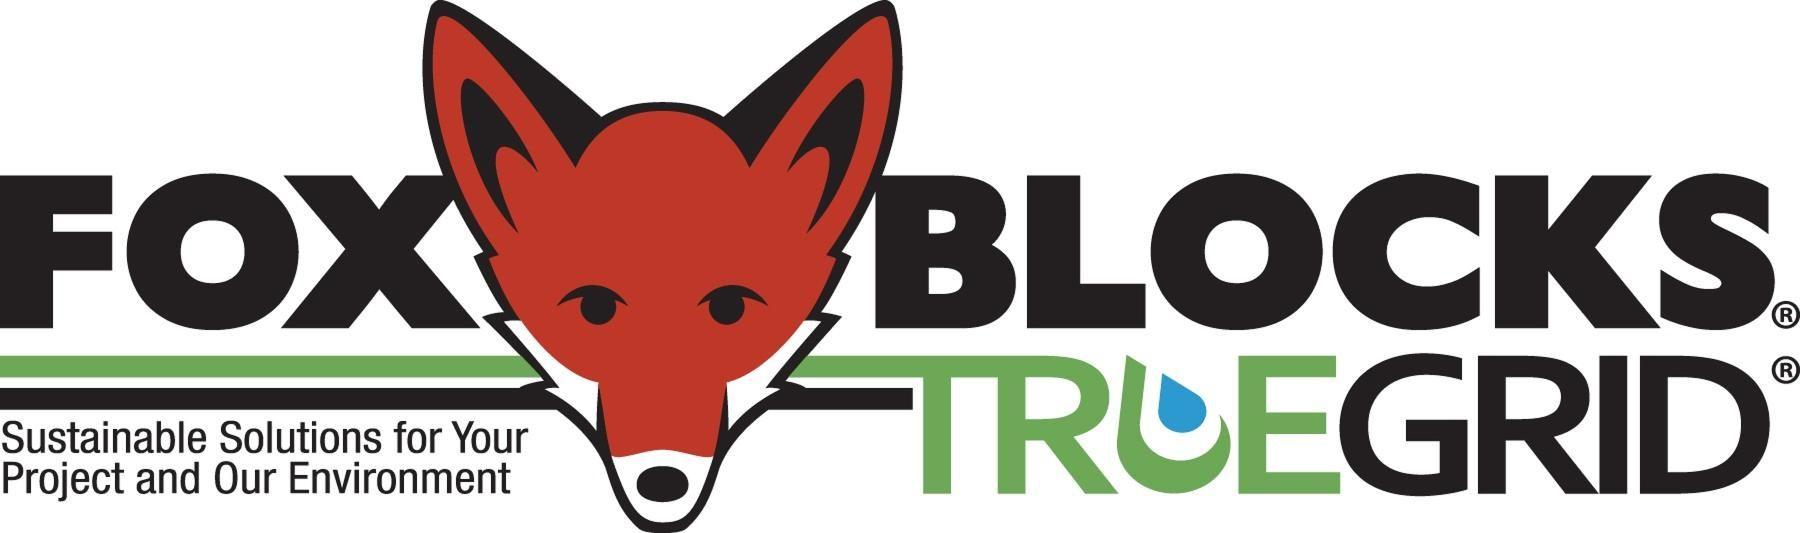 Fox Blocks